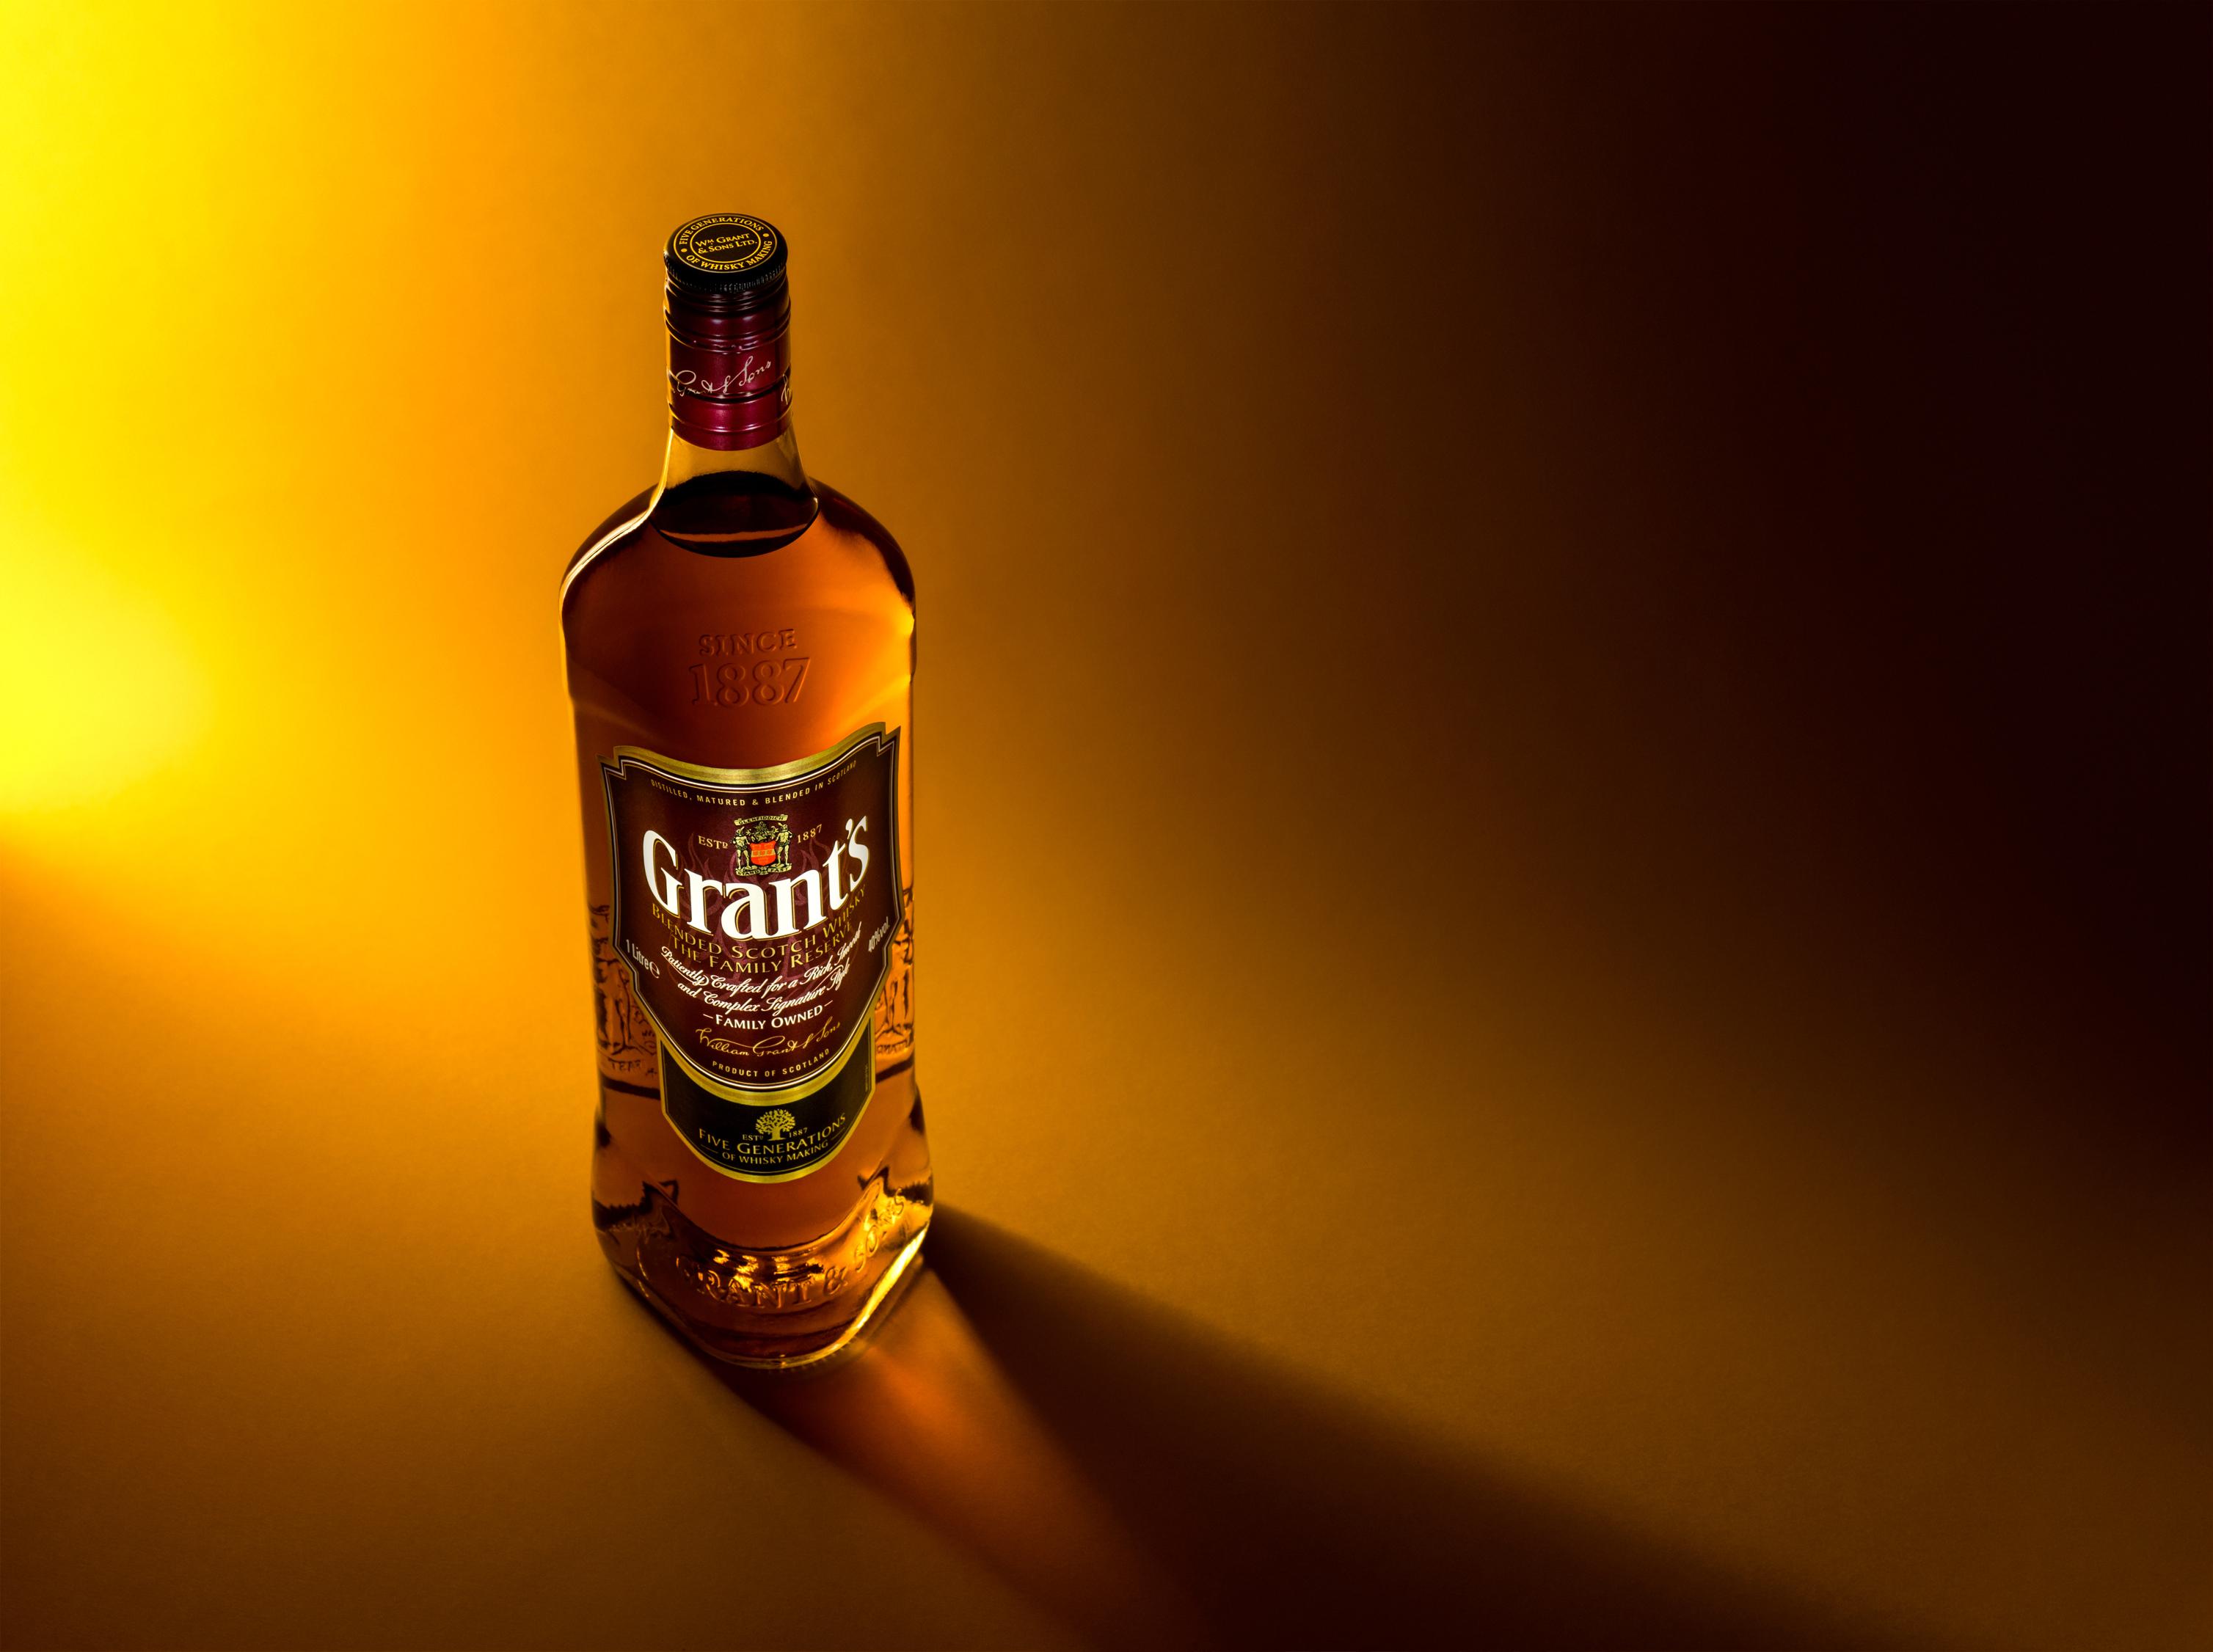 Wallpaper : Whisky, Grants, Scotland, Scotch, Bottle